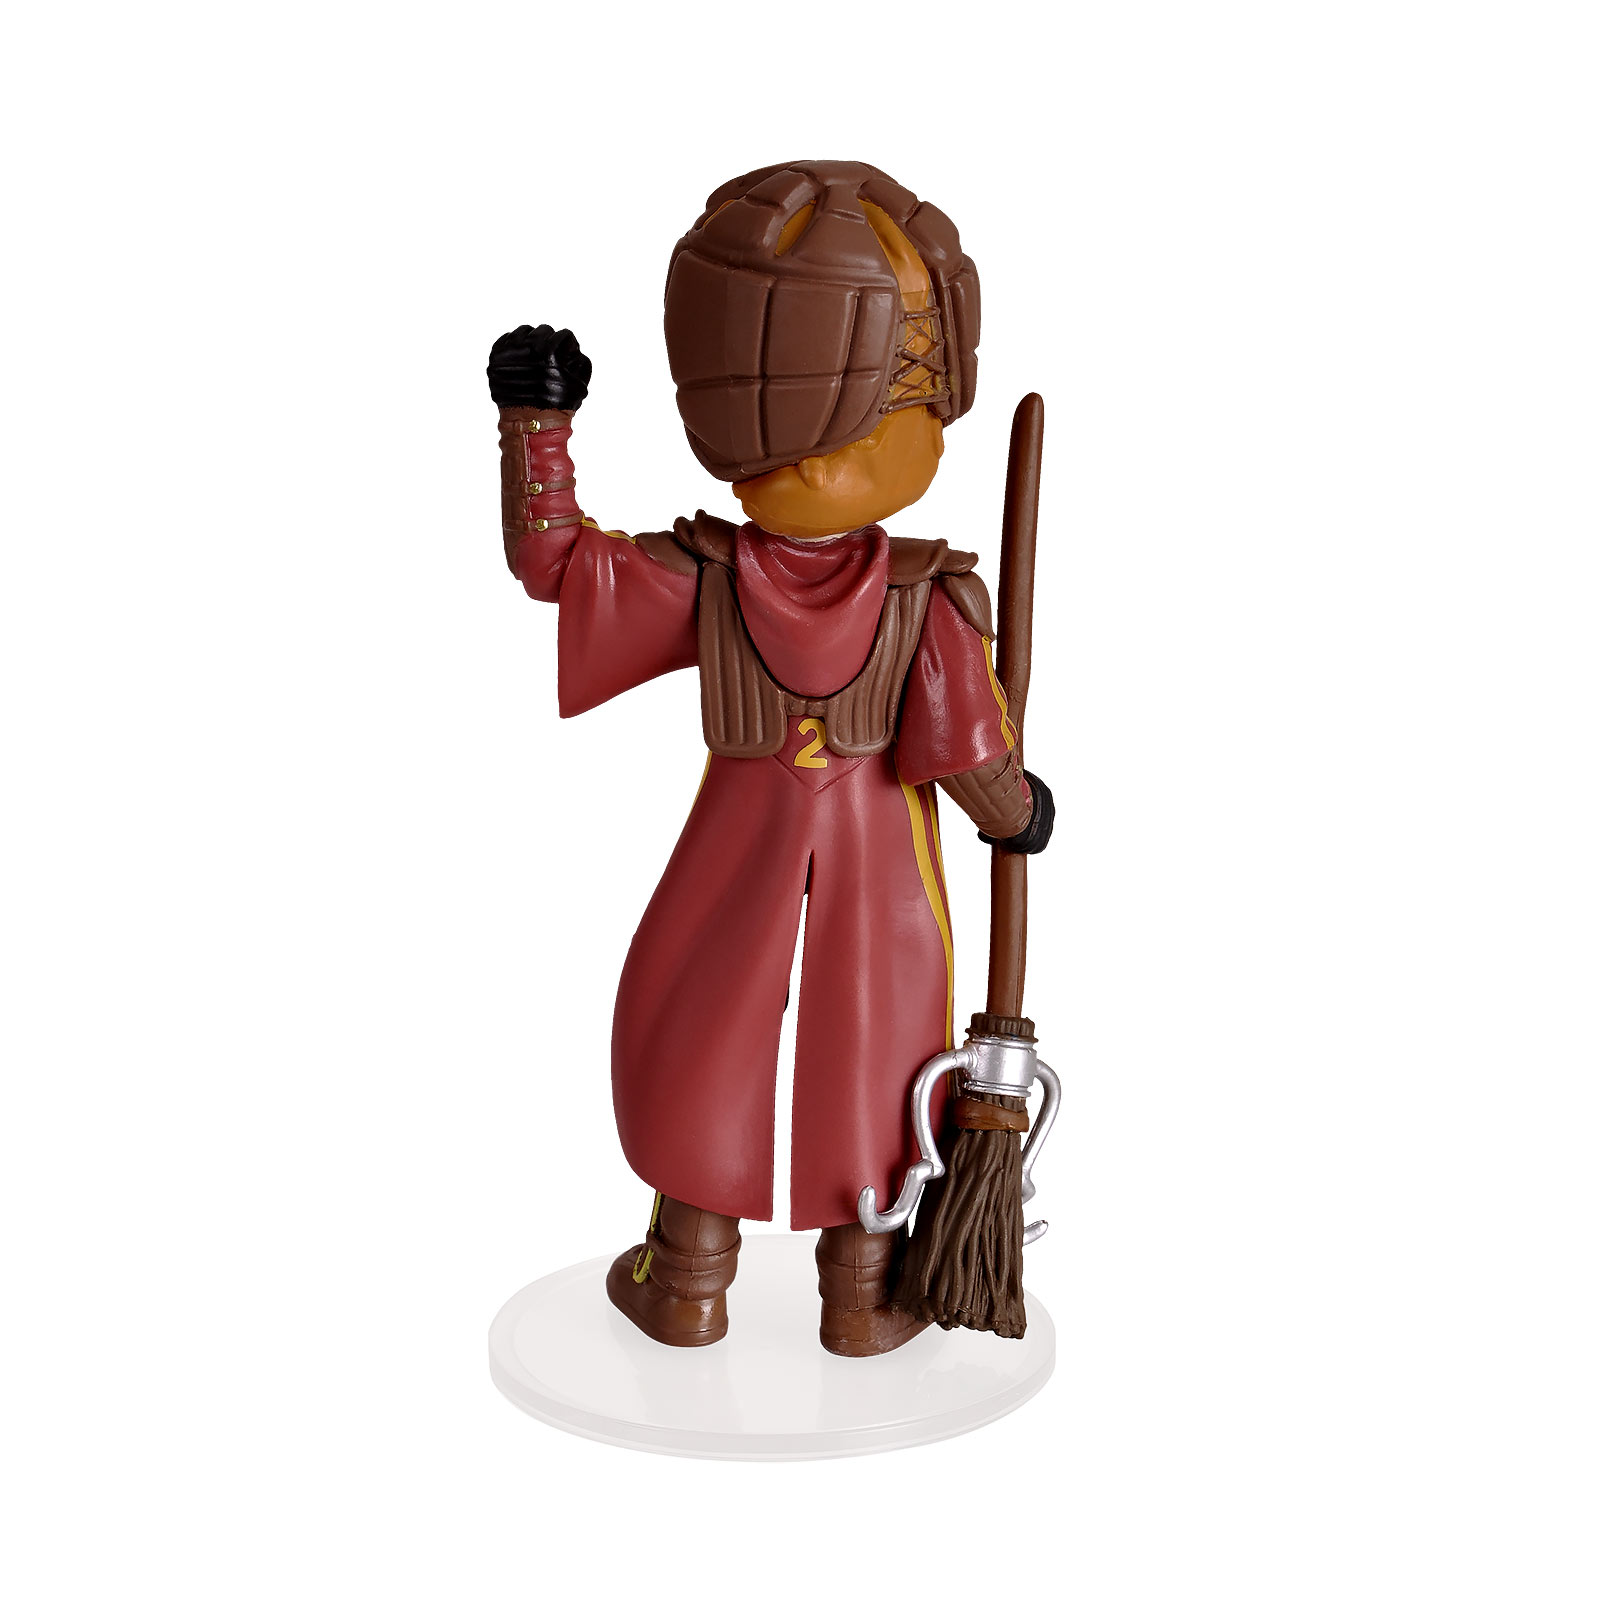 Harry Potter - Ron in Quidditch Uniform Rock Candy Figur